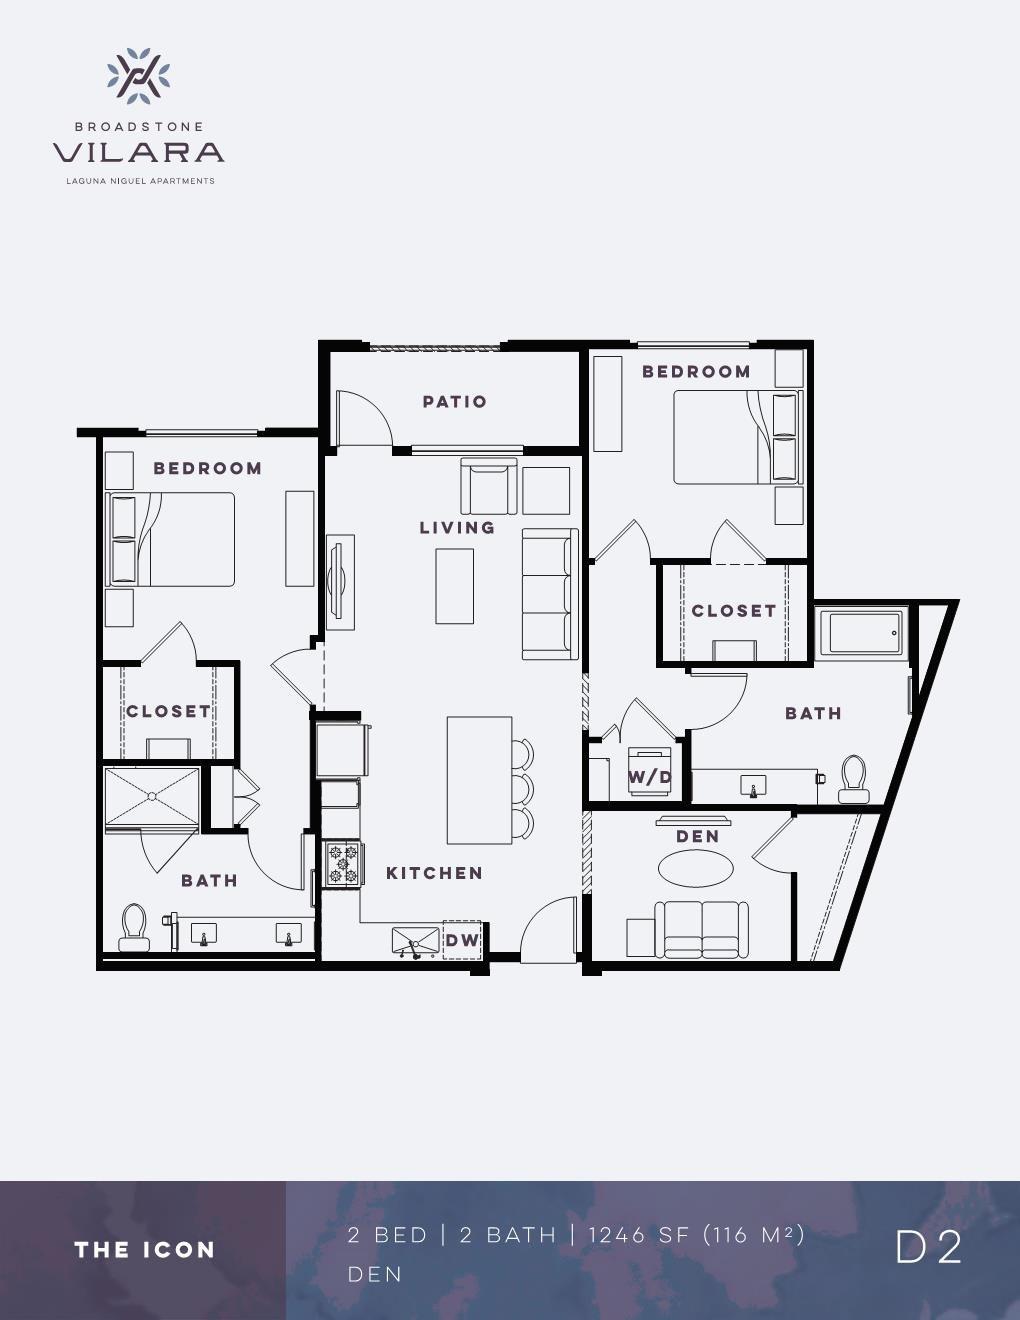 Two Bedroom Den Apartment The Icon Broadstone Vilara Floor Plans Apartment Floor Plans How To Plan